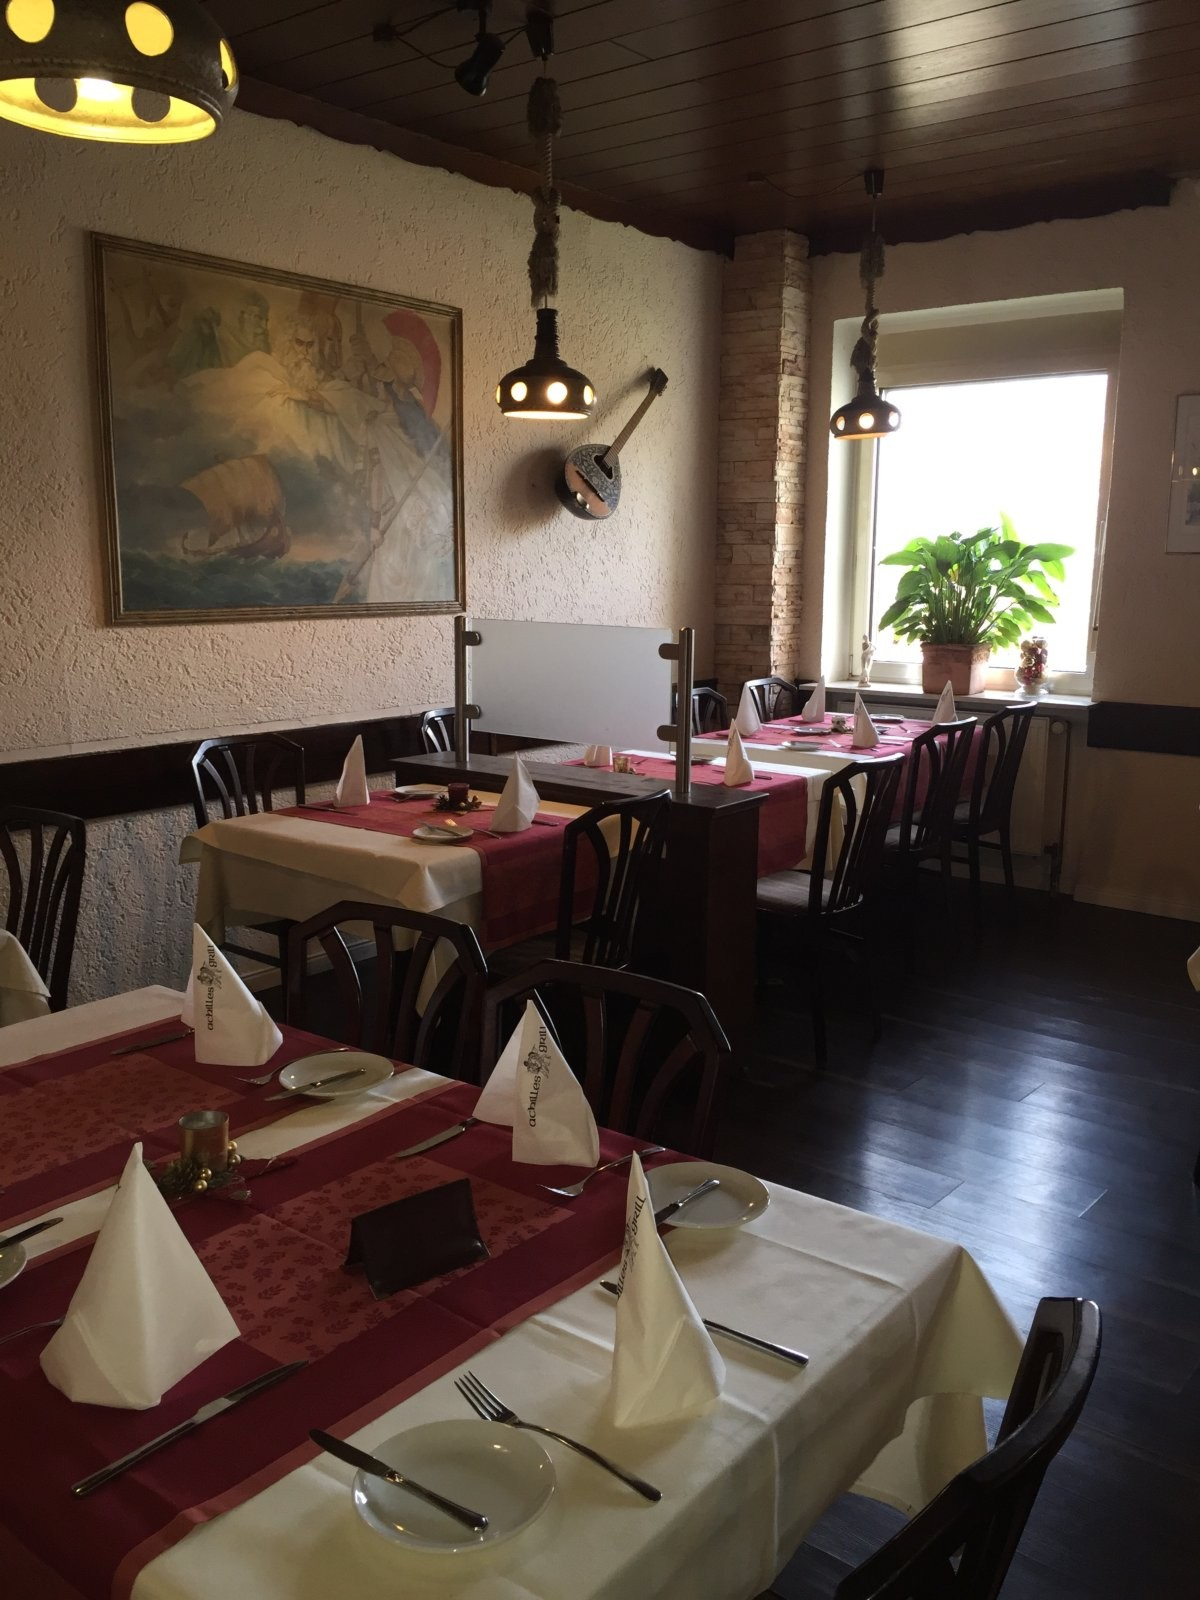 Fotos de Hotel-Restaurant Achilles Grill